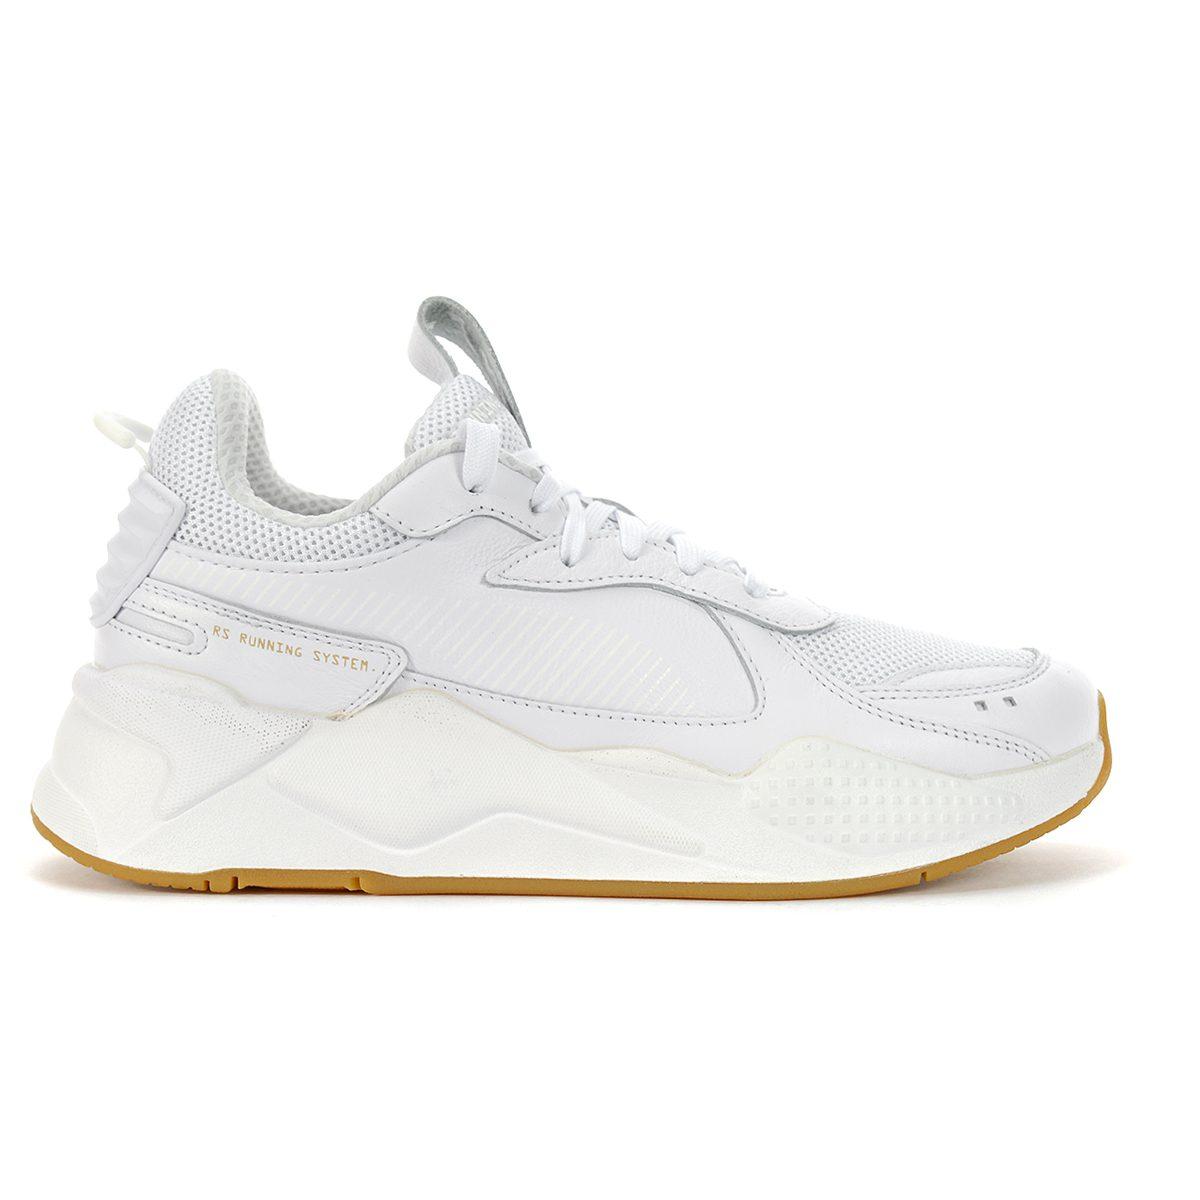 Puma Men's RS-X Blanco Puma White/Gum